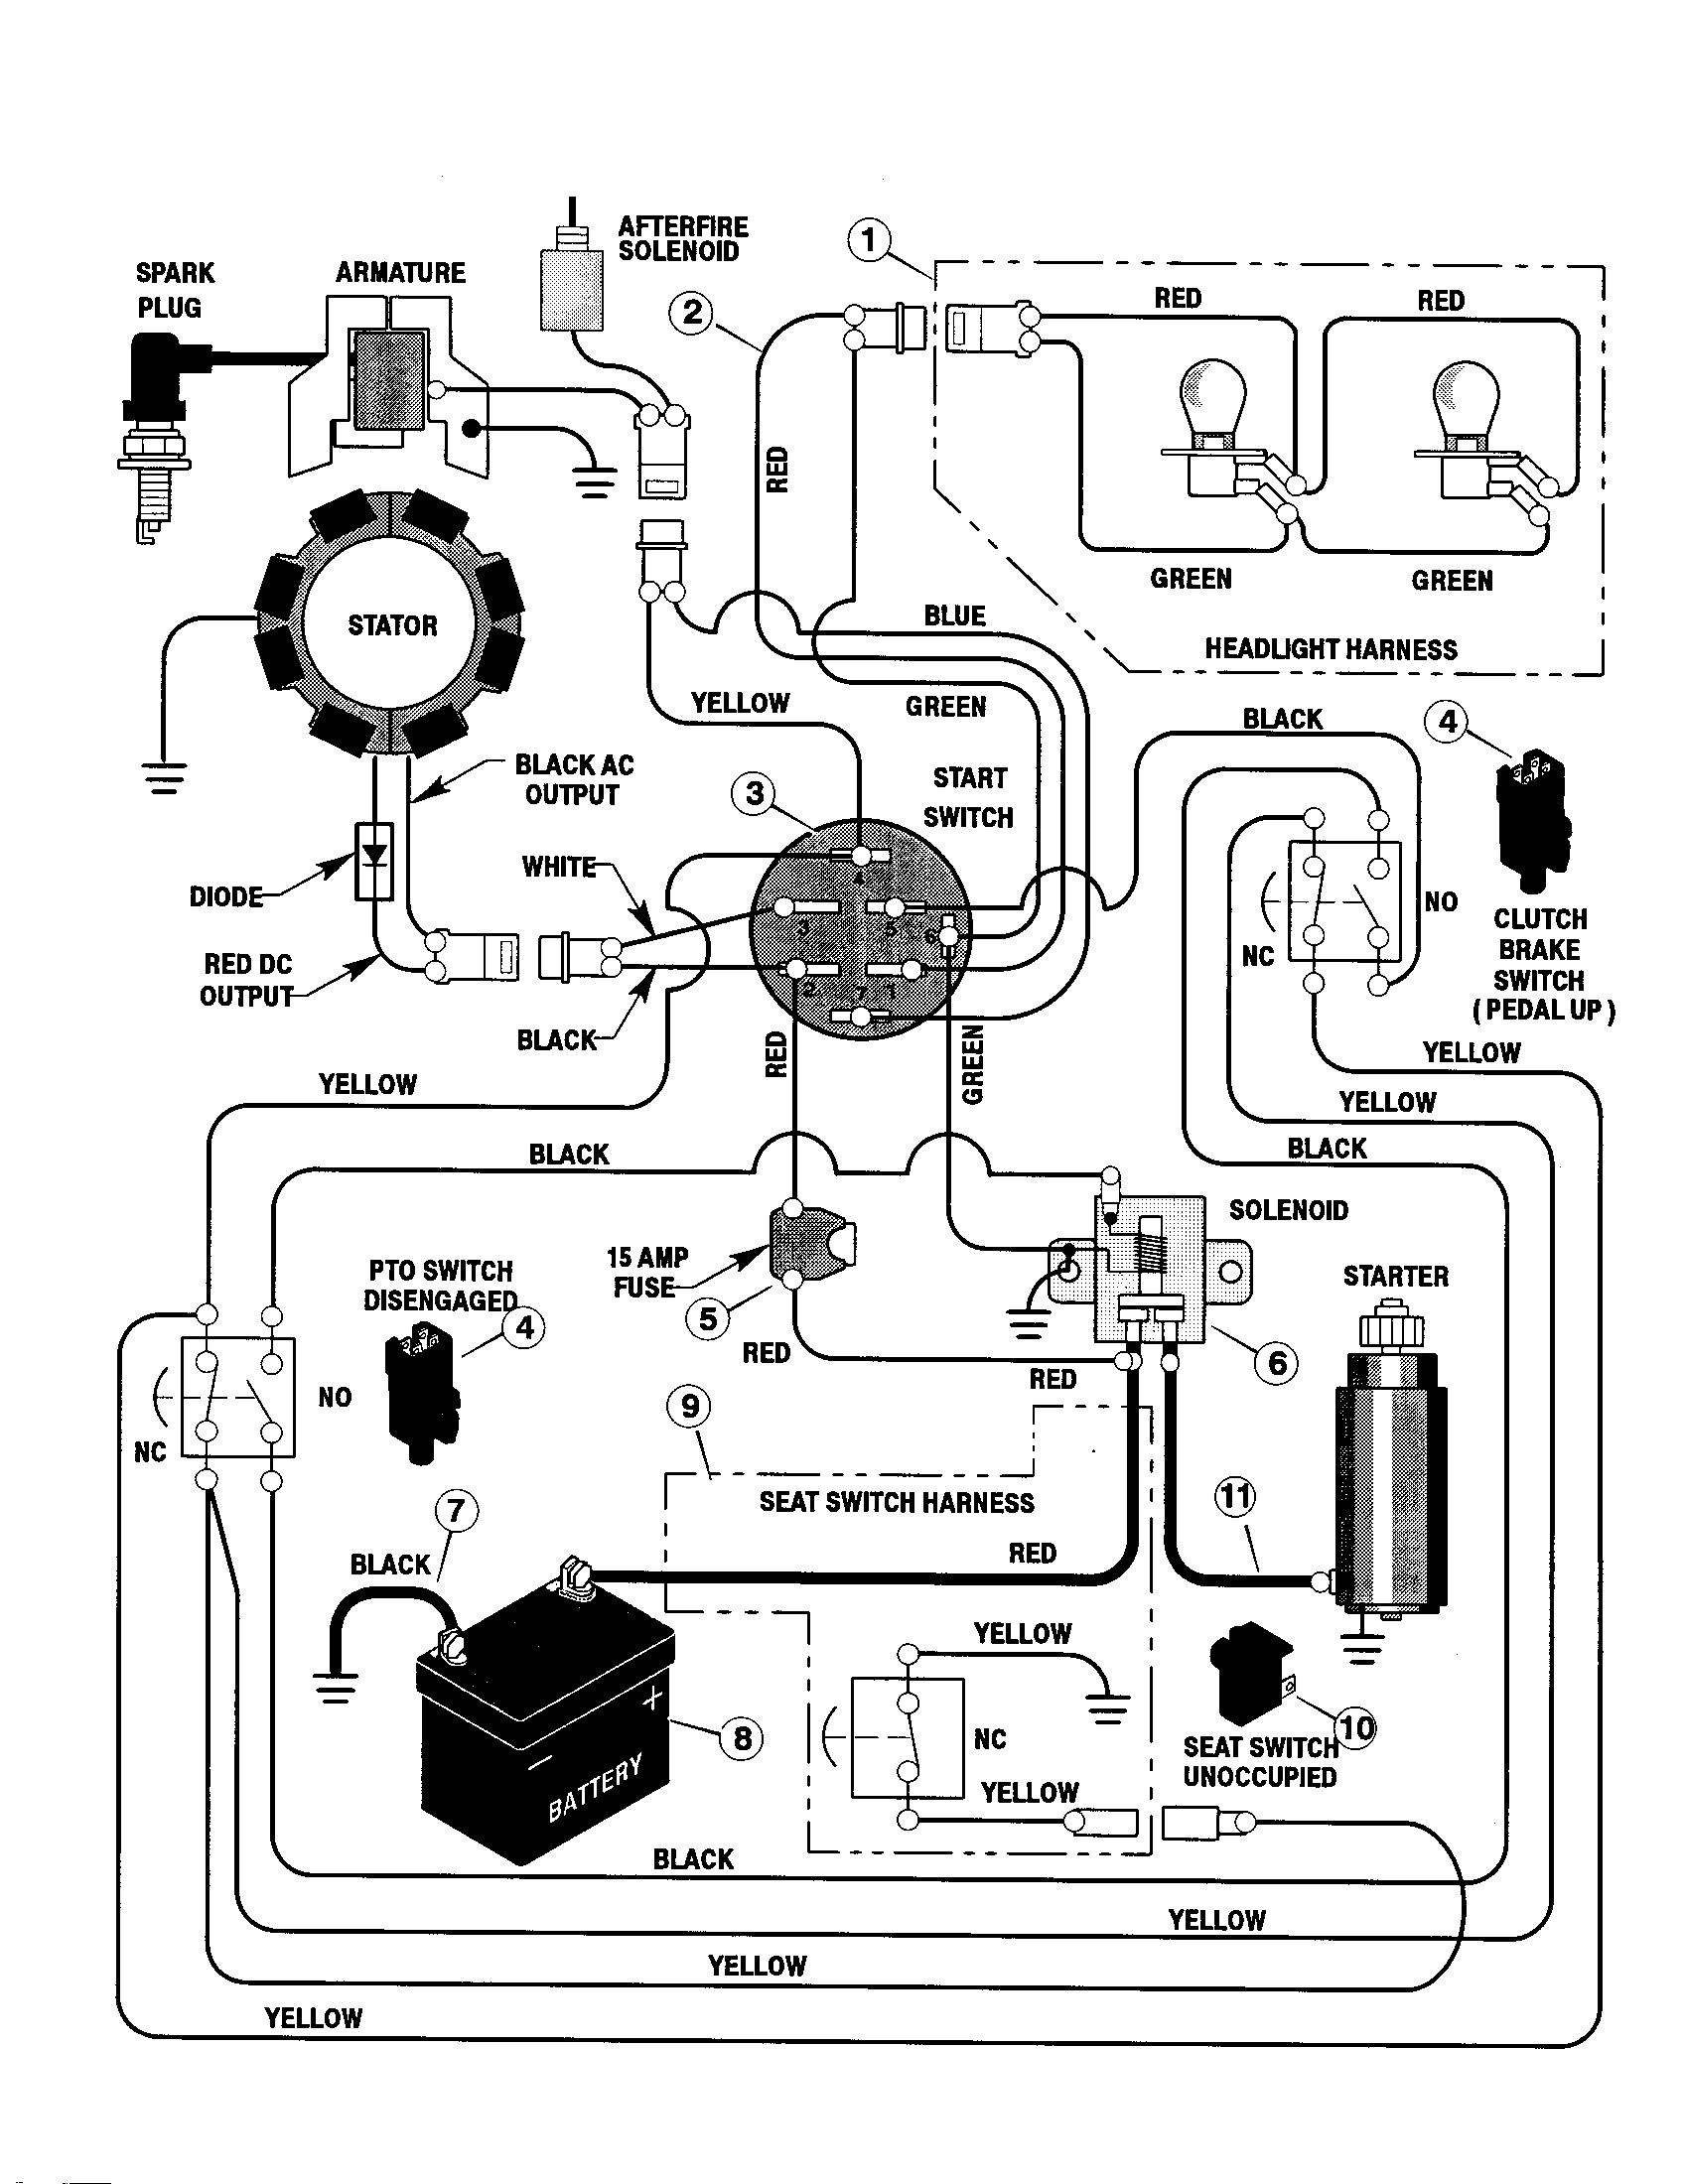 craftsman wiring harness diagram - 1994 toyota corolla fuse box diagram -  gsxr750.tukune.jeanjaures37.fr  wiring diagram resource